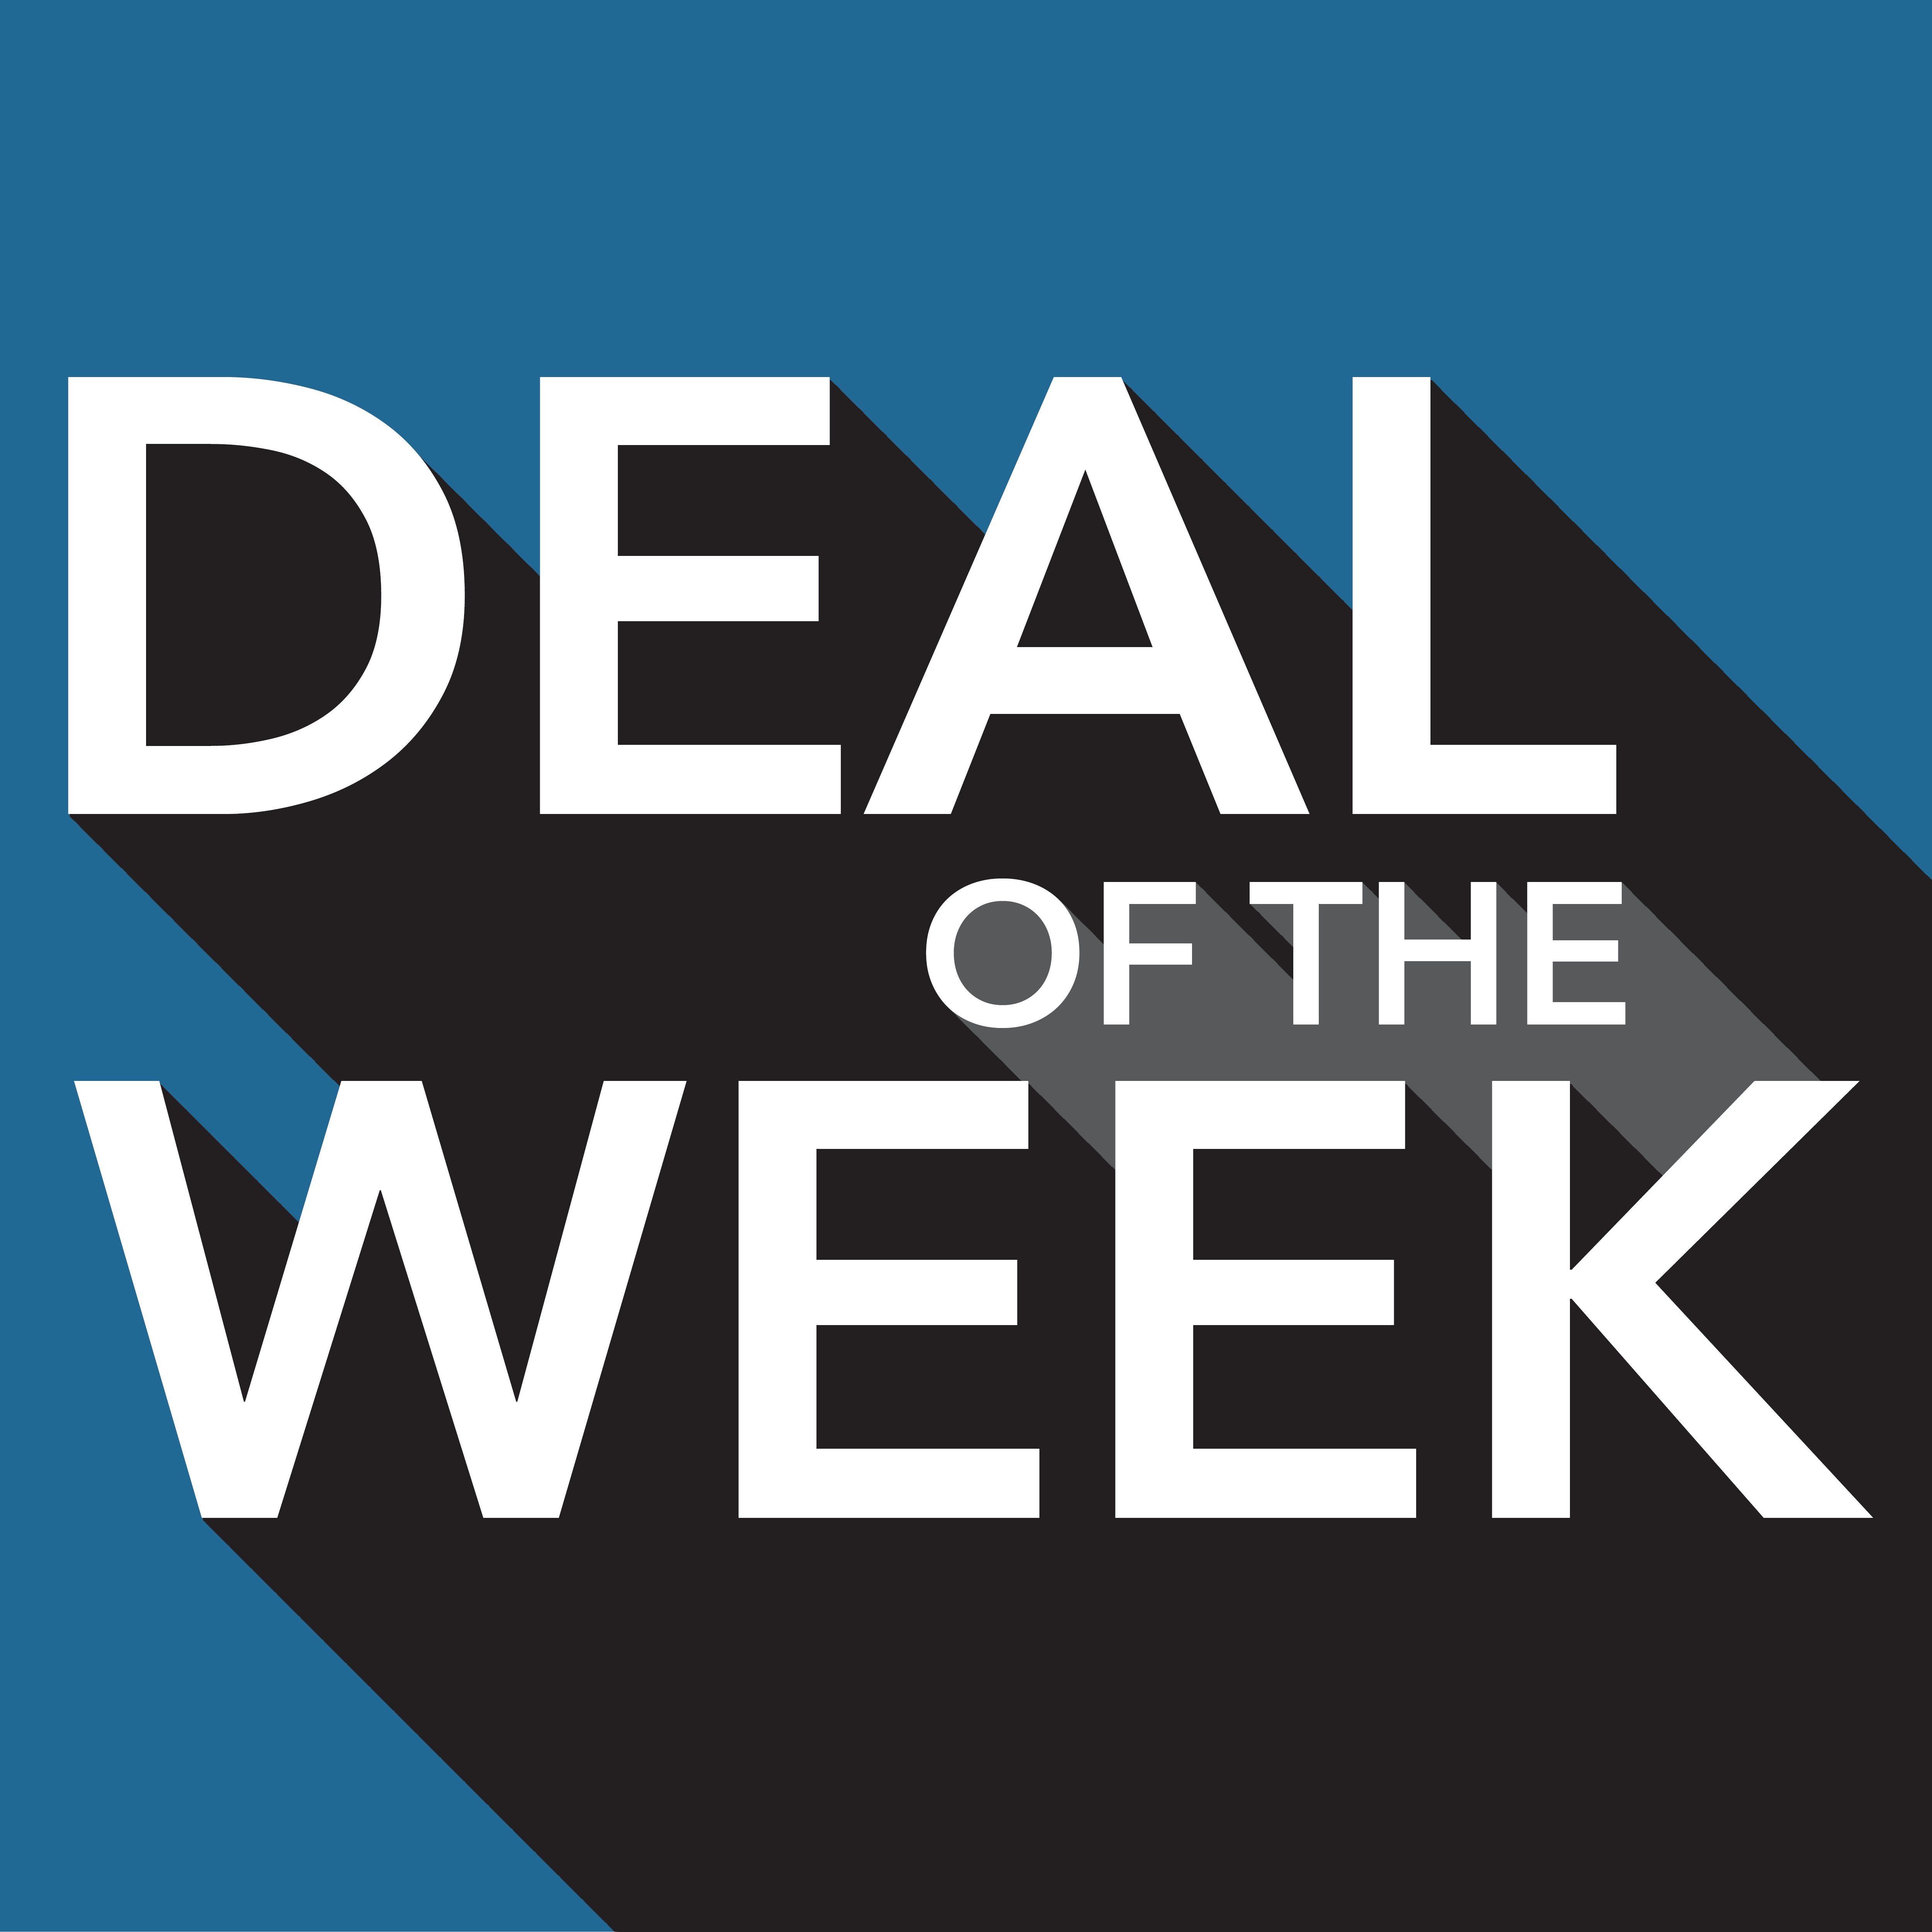 Deal of the Week: Huge Home Renovation Sale